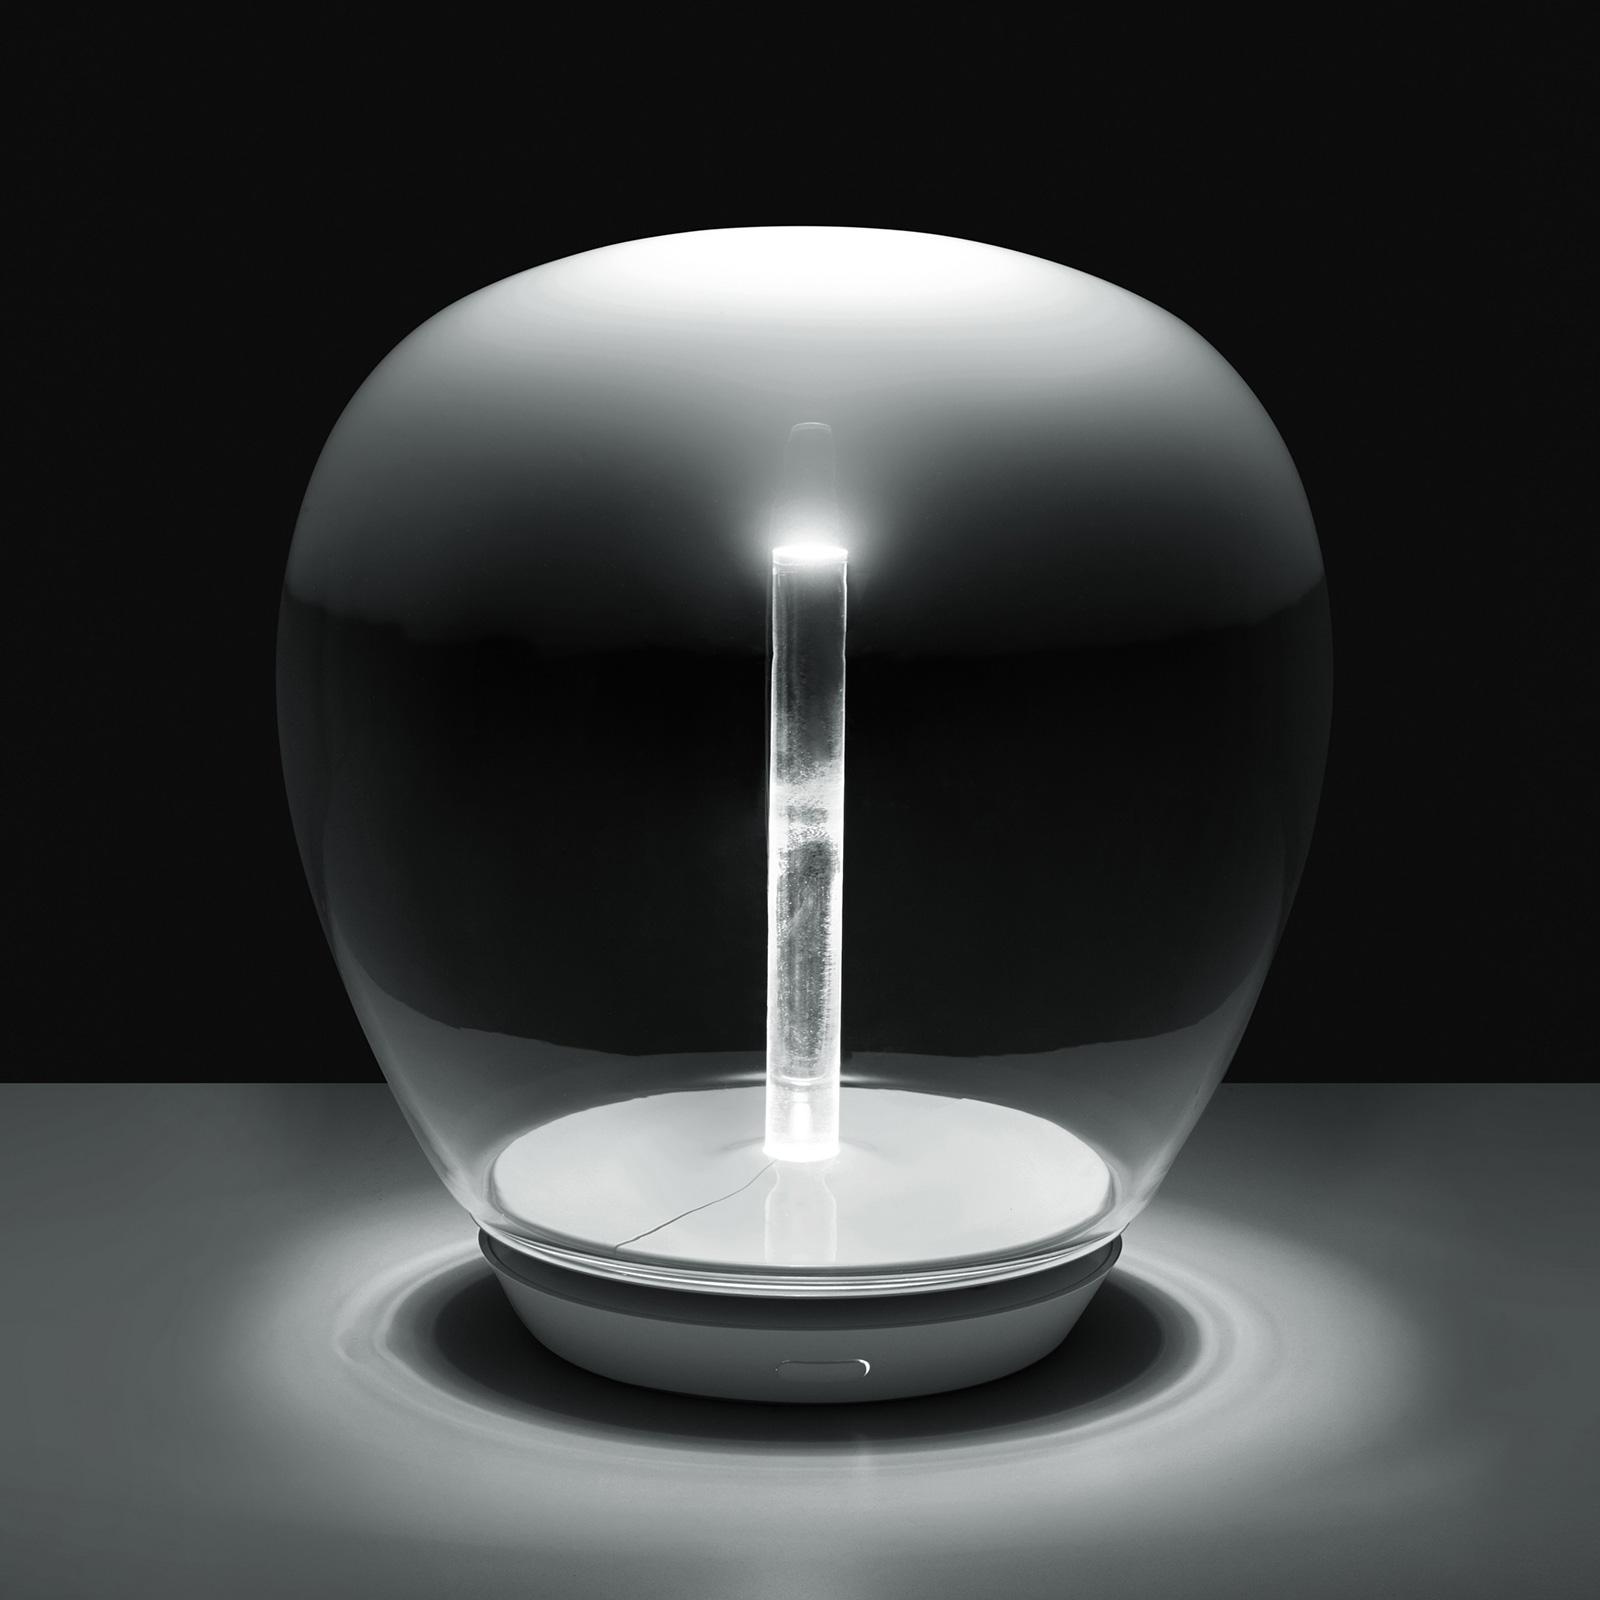 Artemide Empatia Glas-Tischleuchte mit LED, Ø 26cm